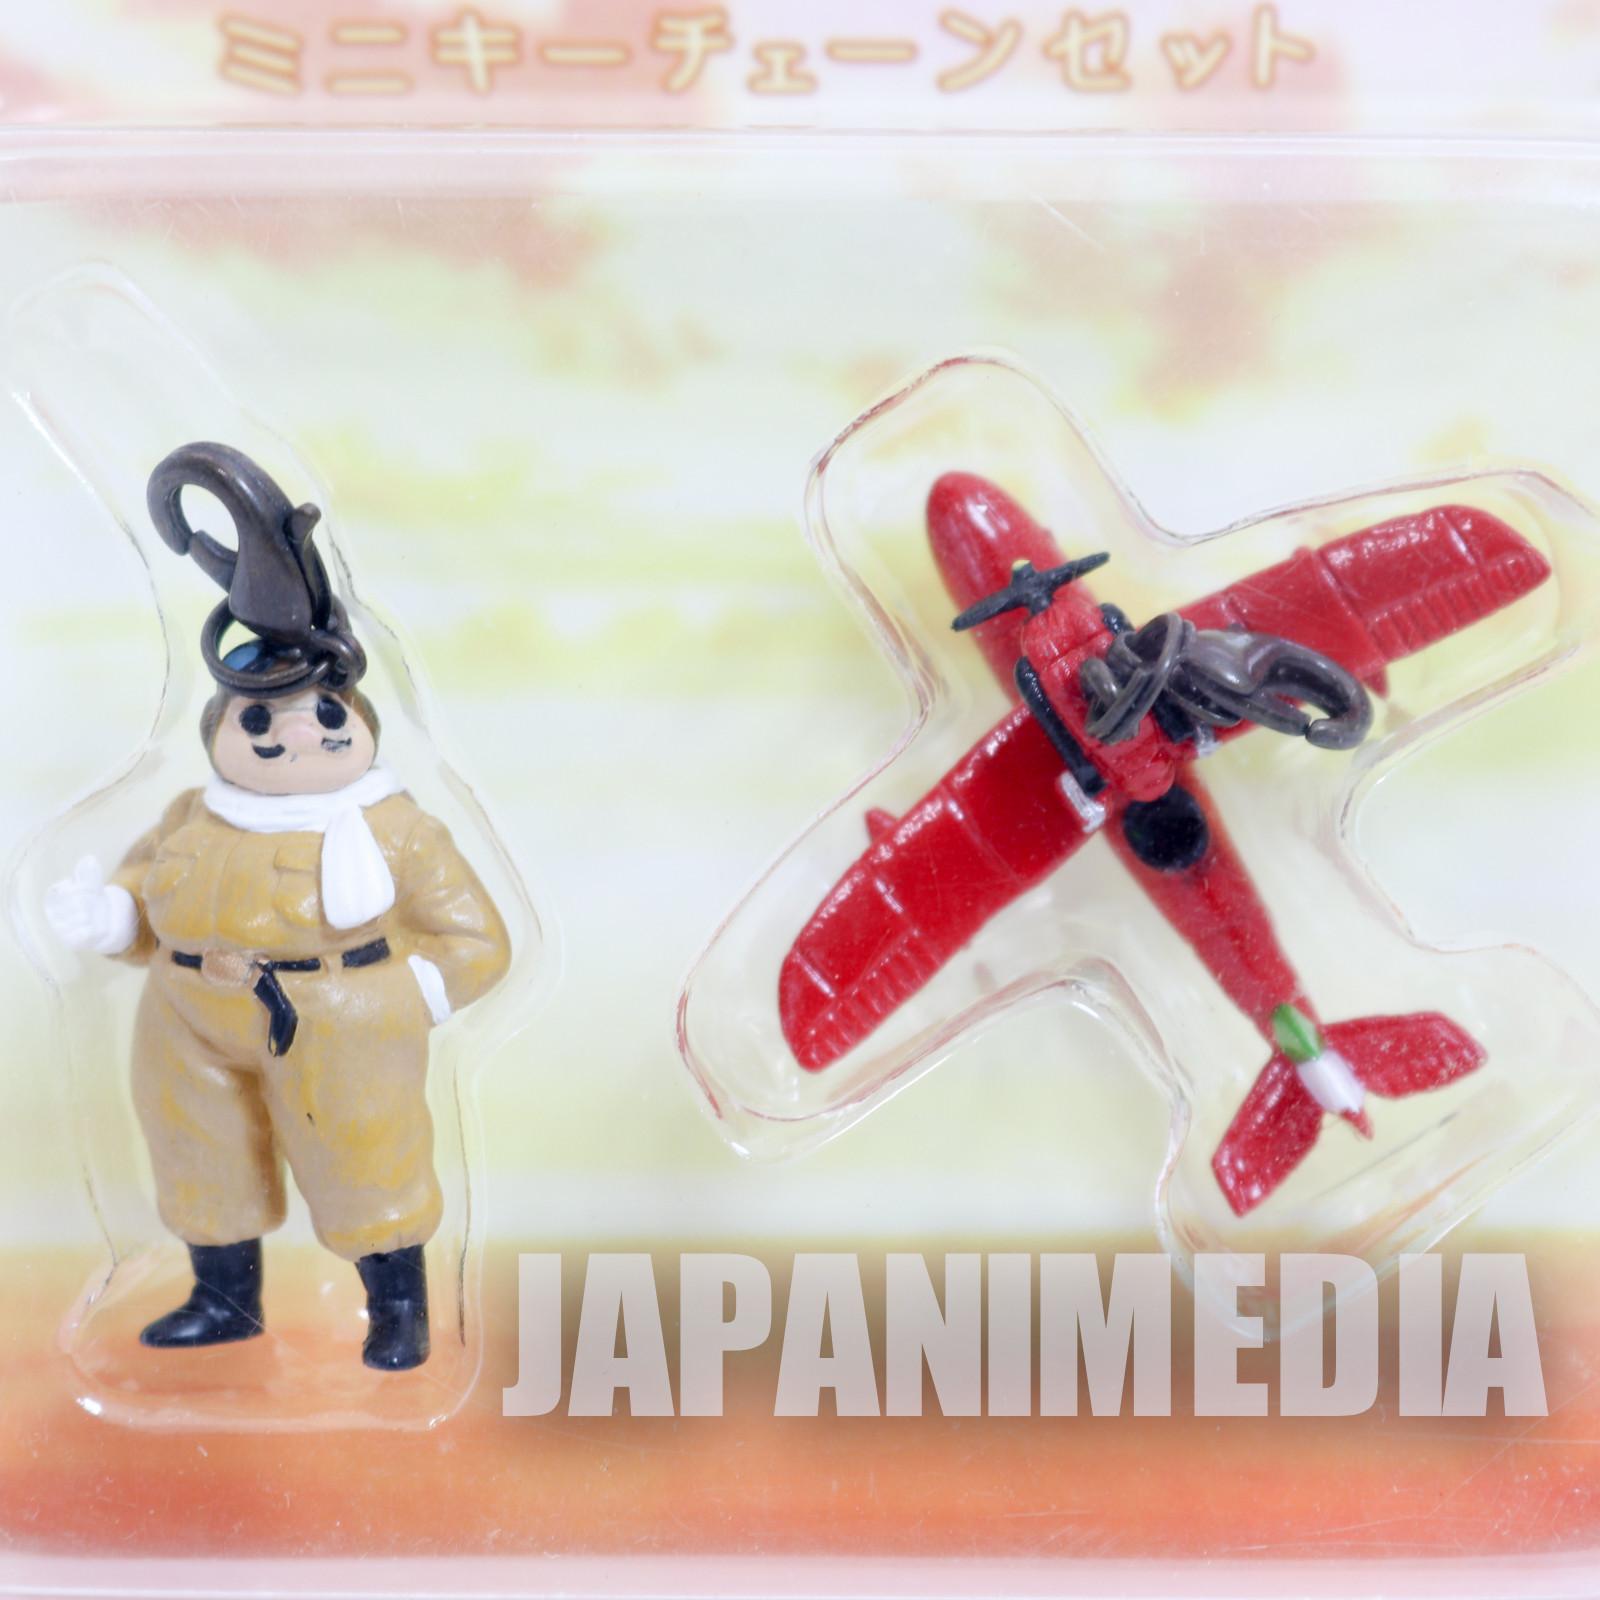 RARE! Porco Rosso Marco Pagot & Savoia Mini Mascot Set Ghibli Hayao Miyazaki